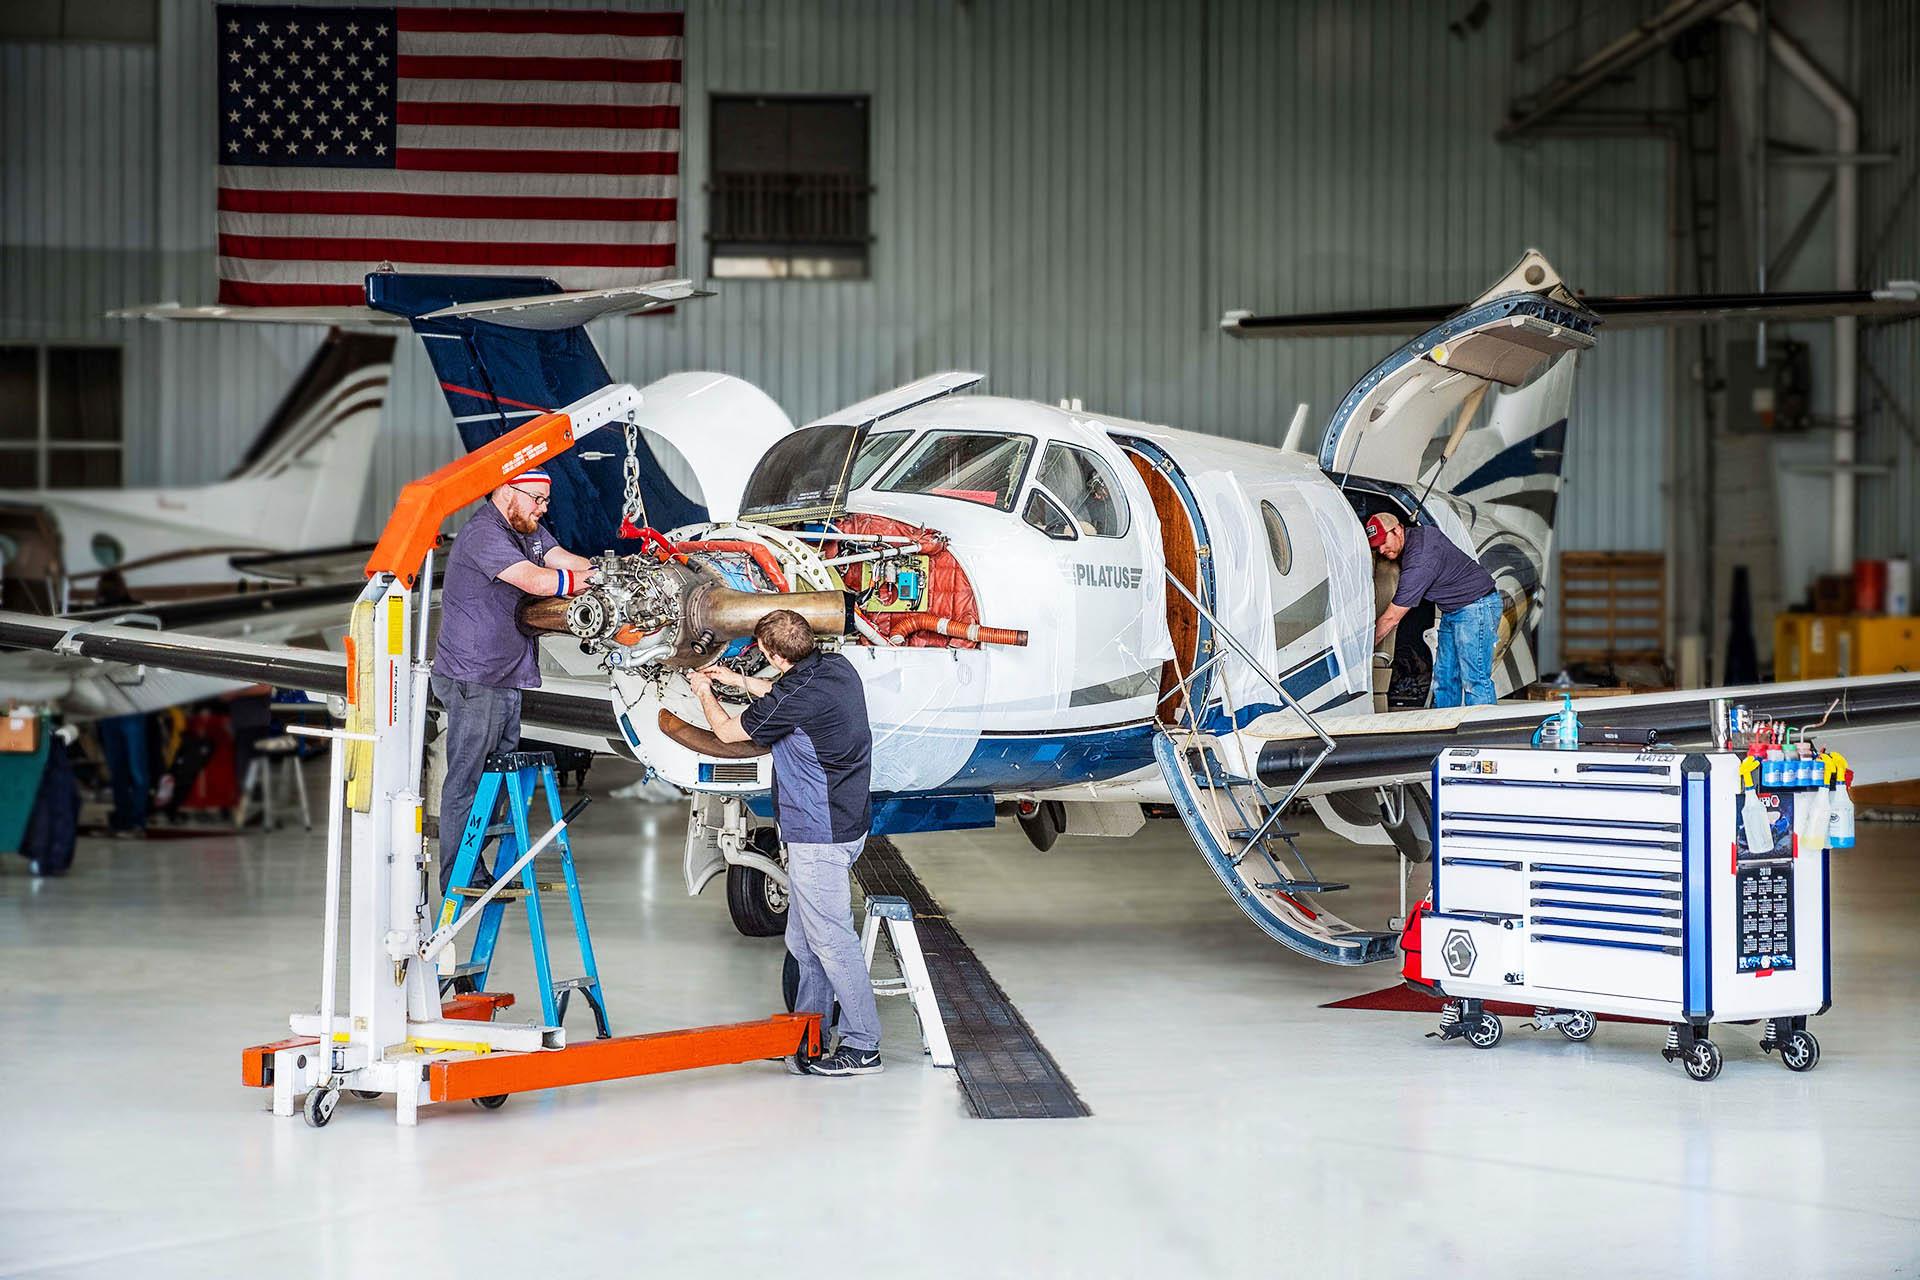 pc-12 Pilatus service fargo jet center